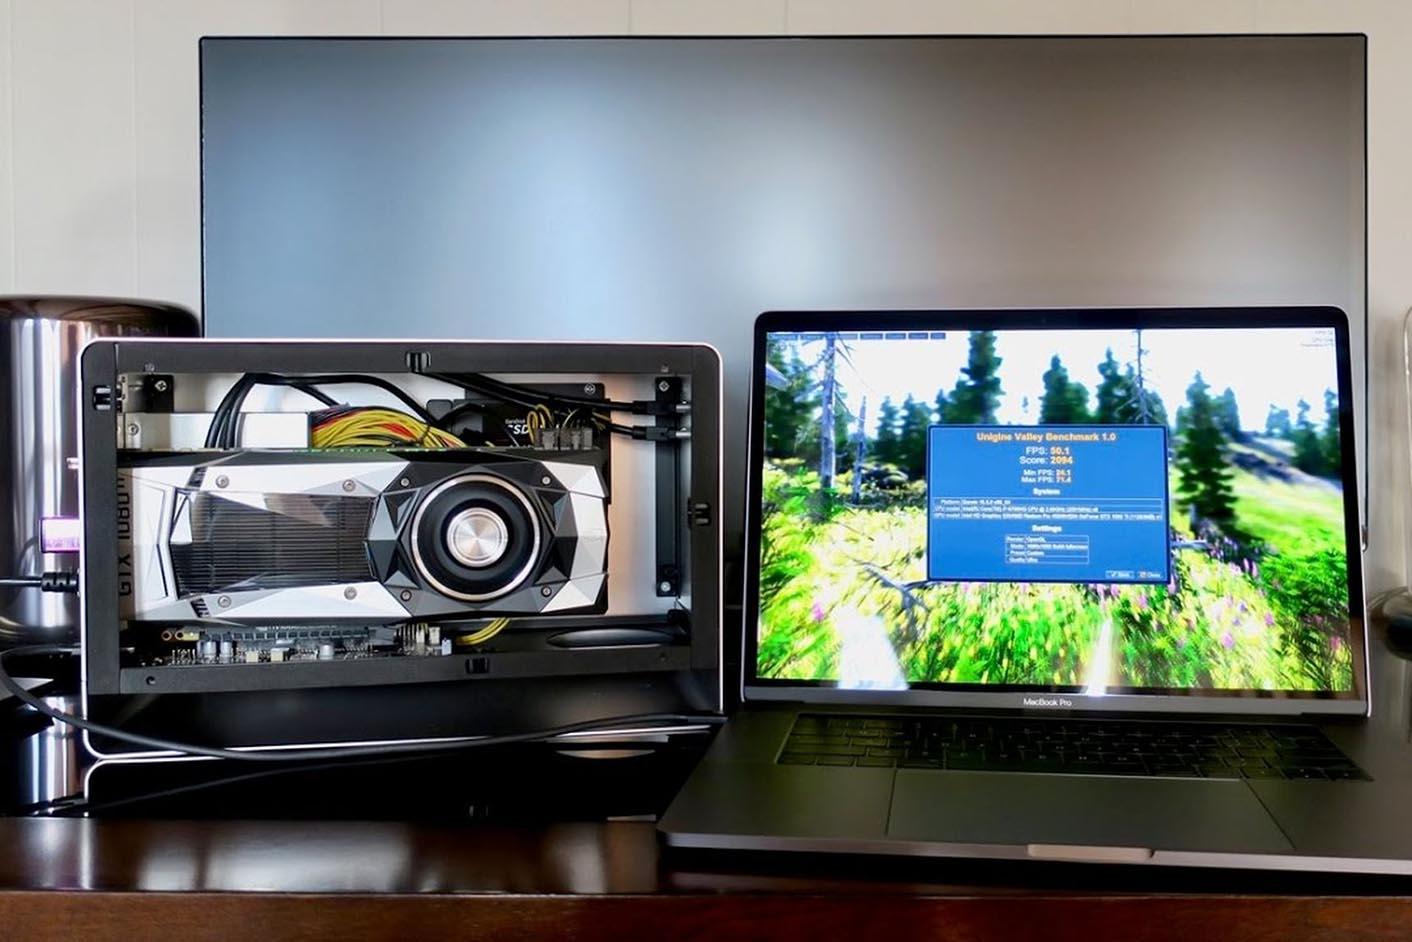 Nvidia GTX 1080 Ti MacBook Pro